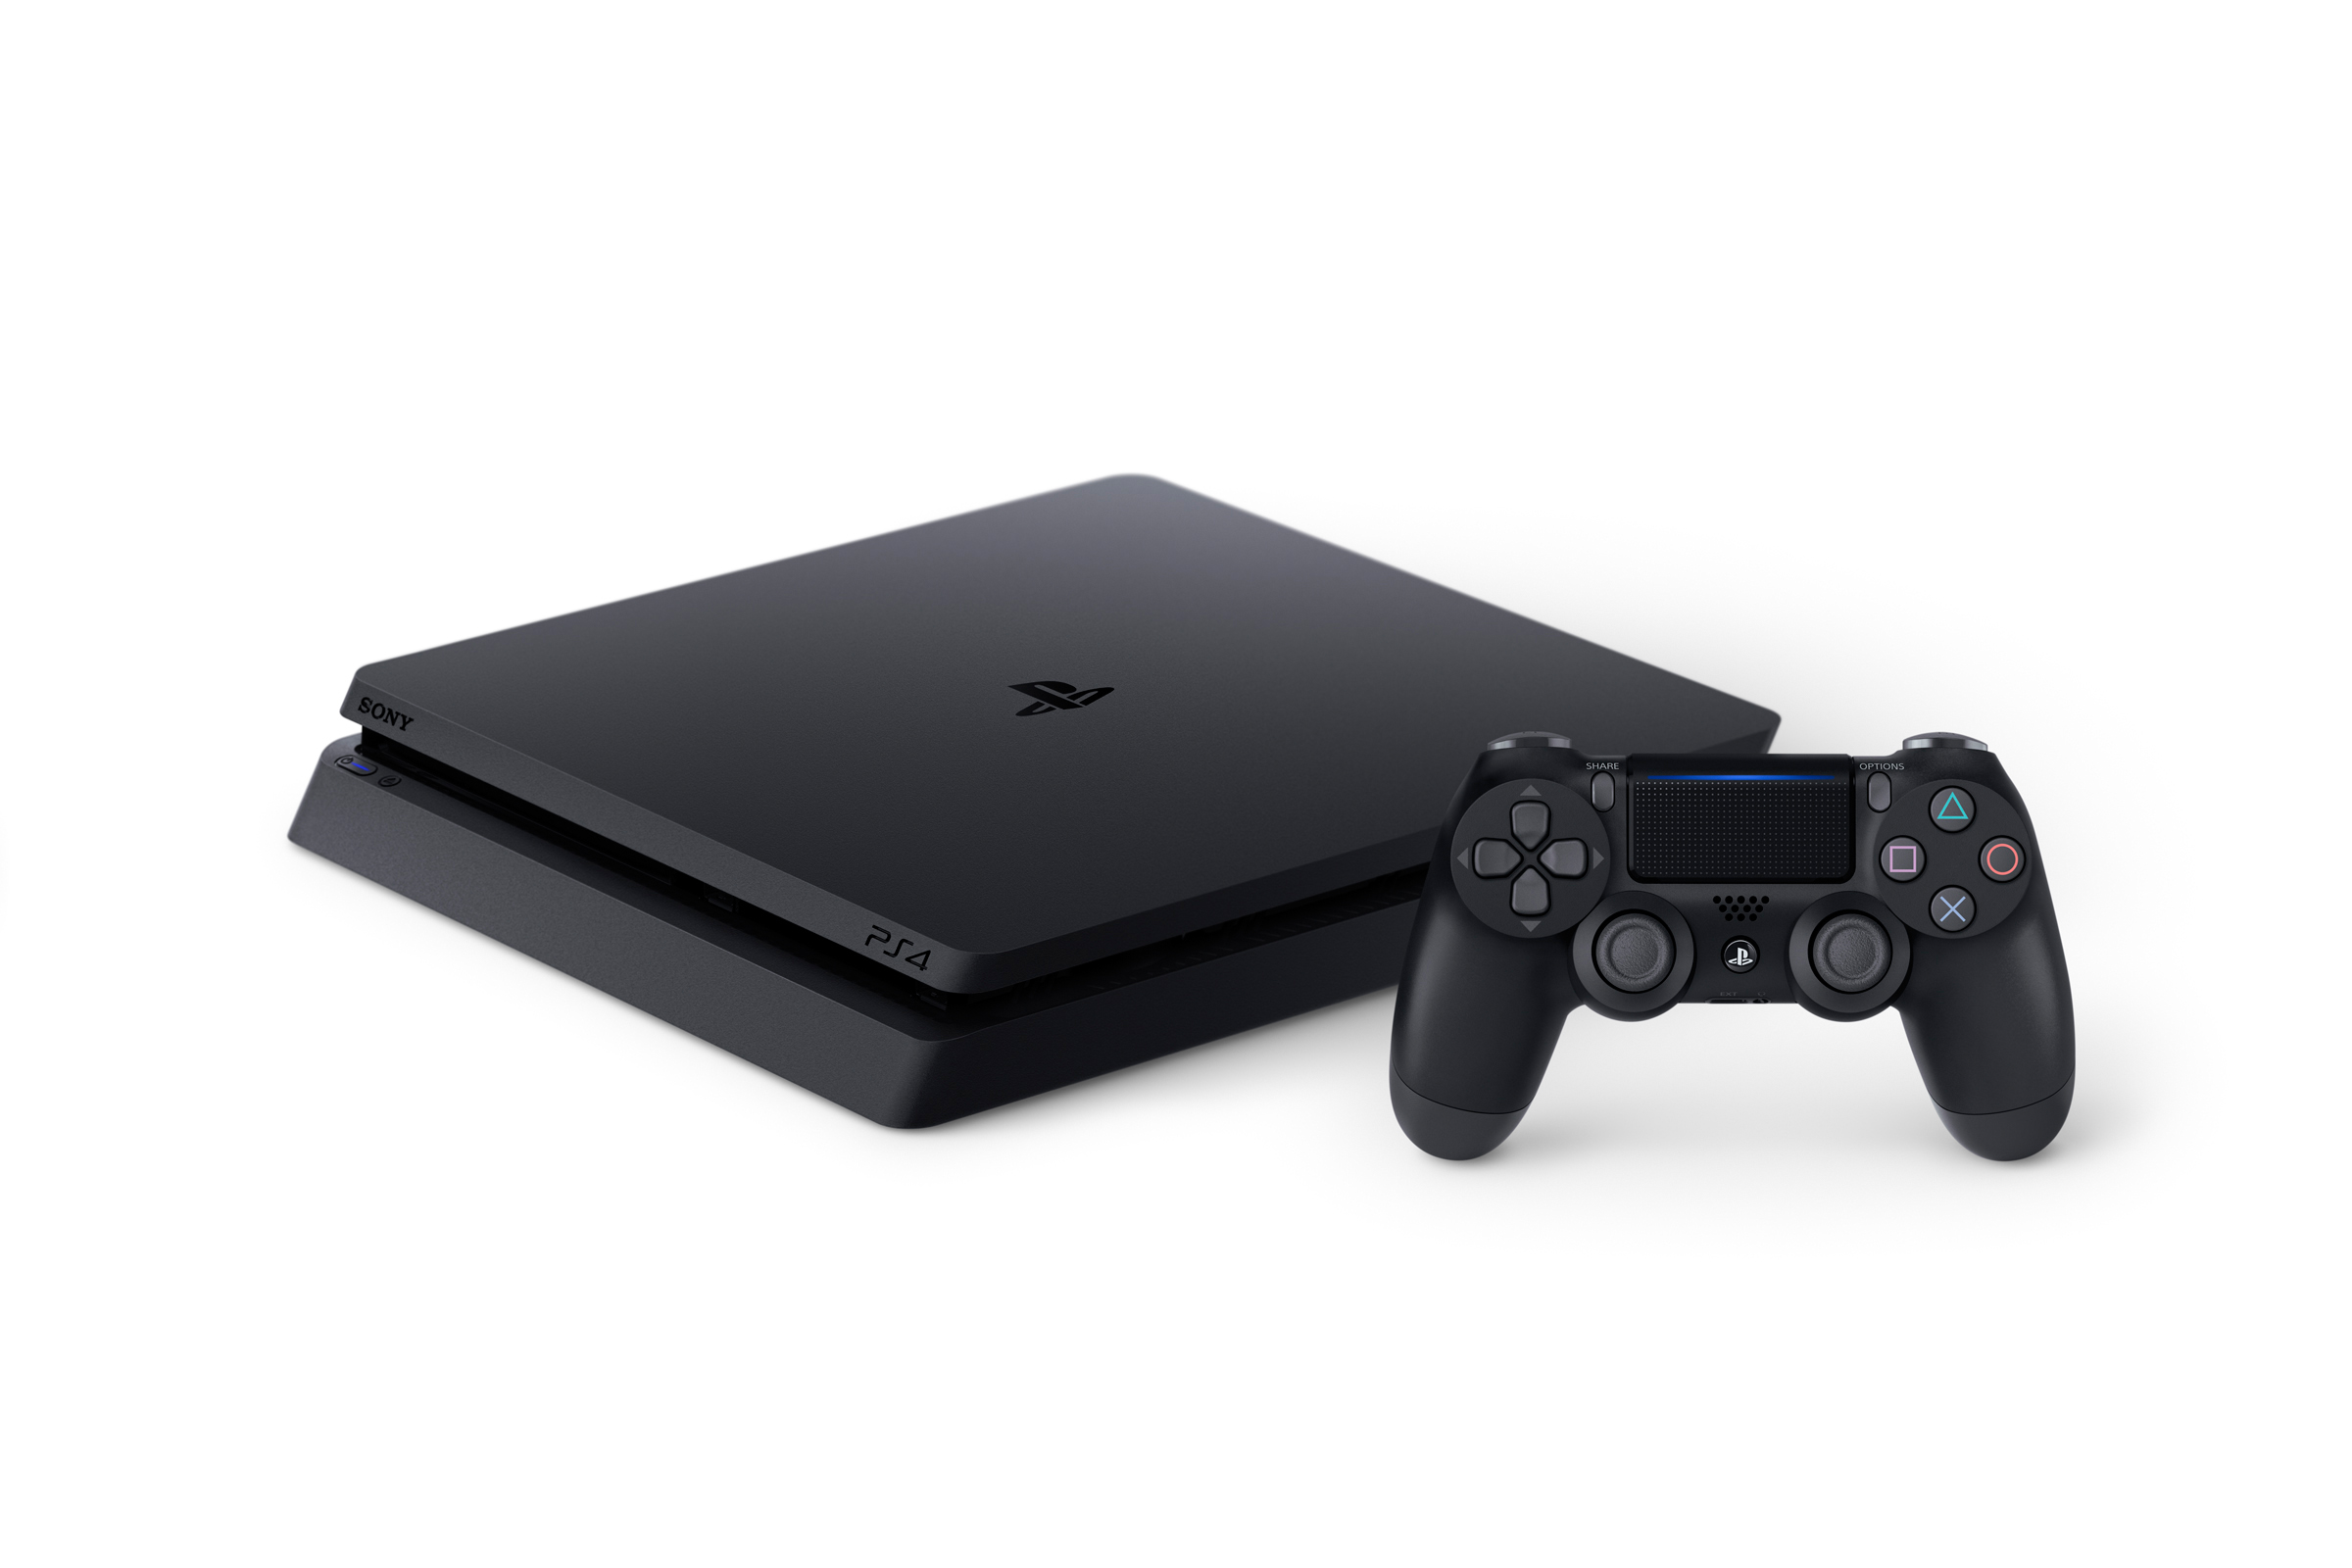 Spuntano in rete sei bundle per PlayStation 4 Slim